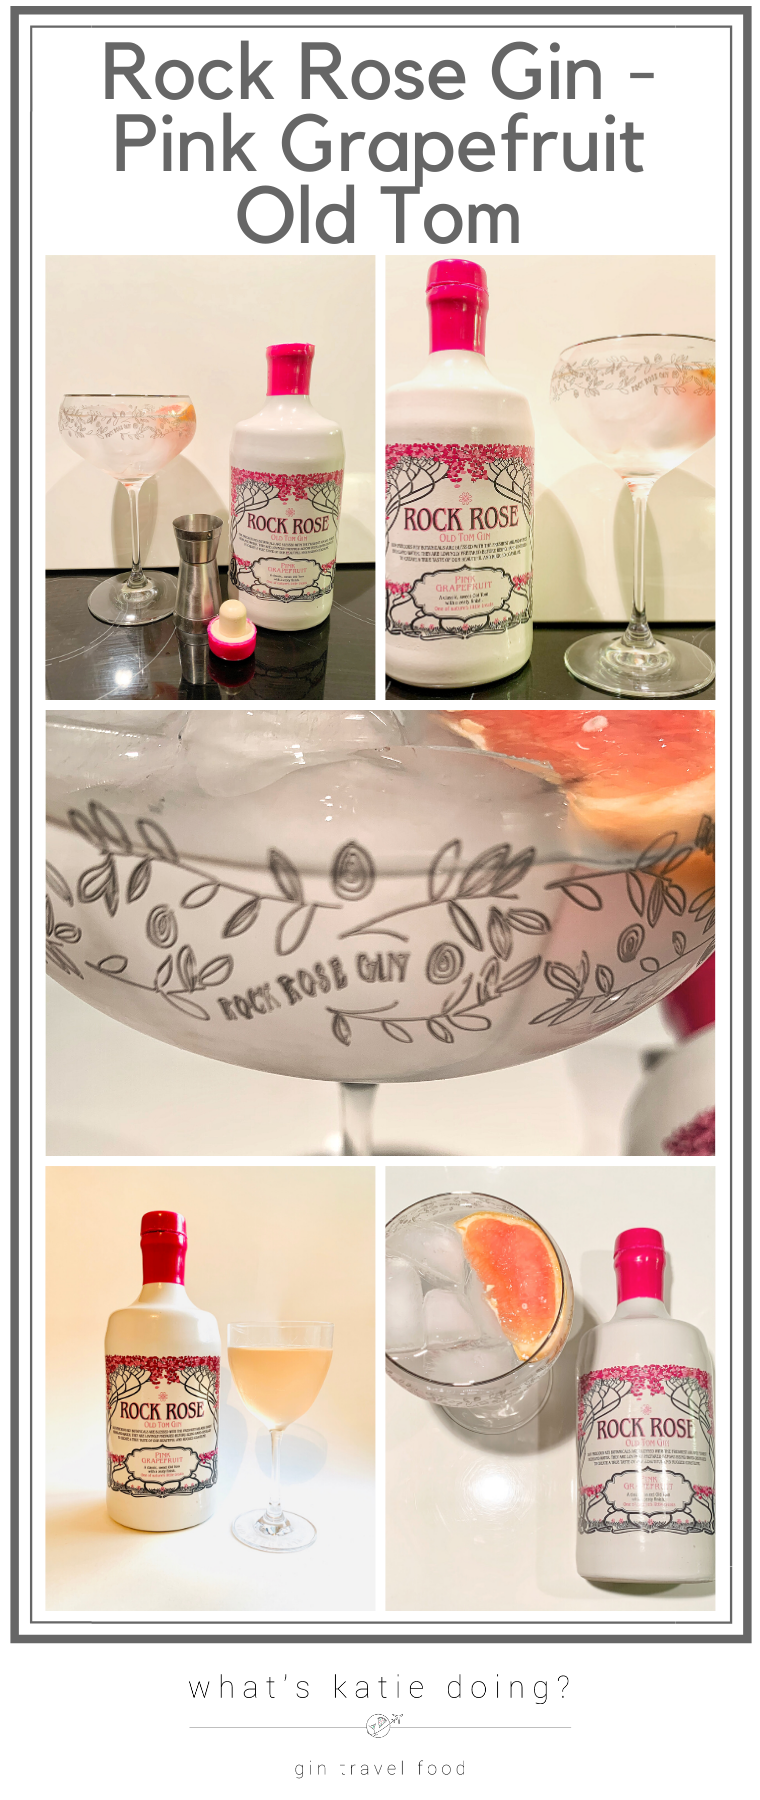 Rock Rose Gin - Pink Grapefruit Old Tom